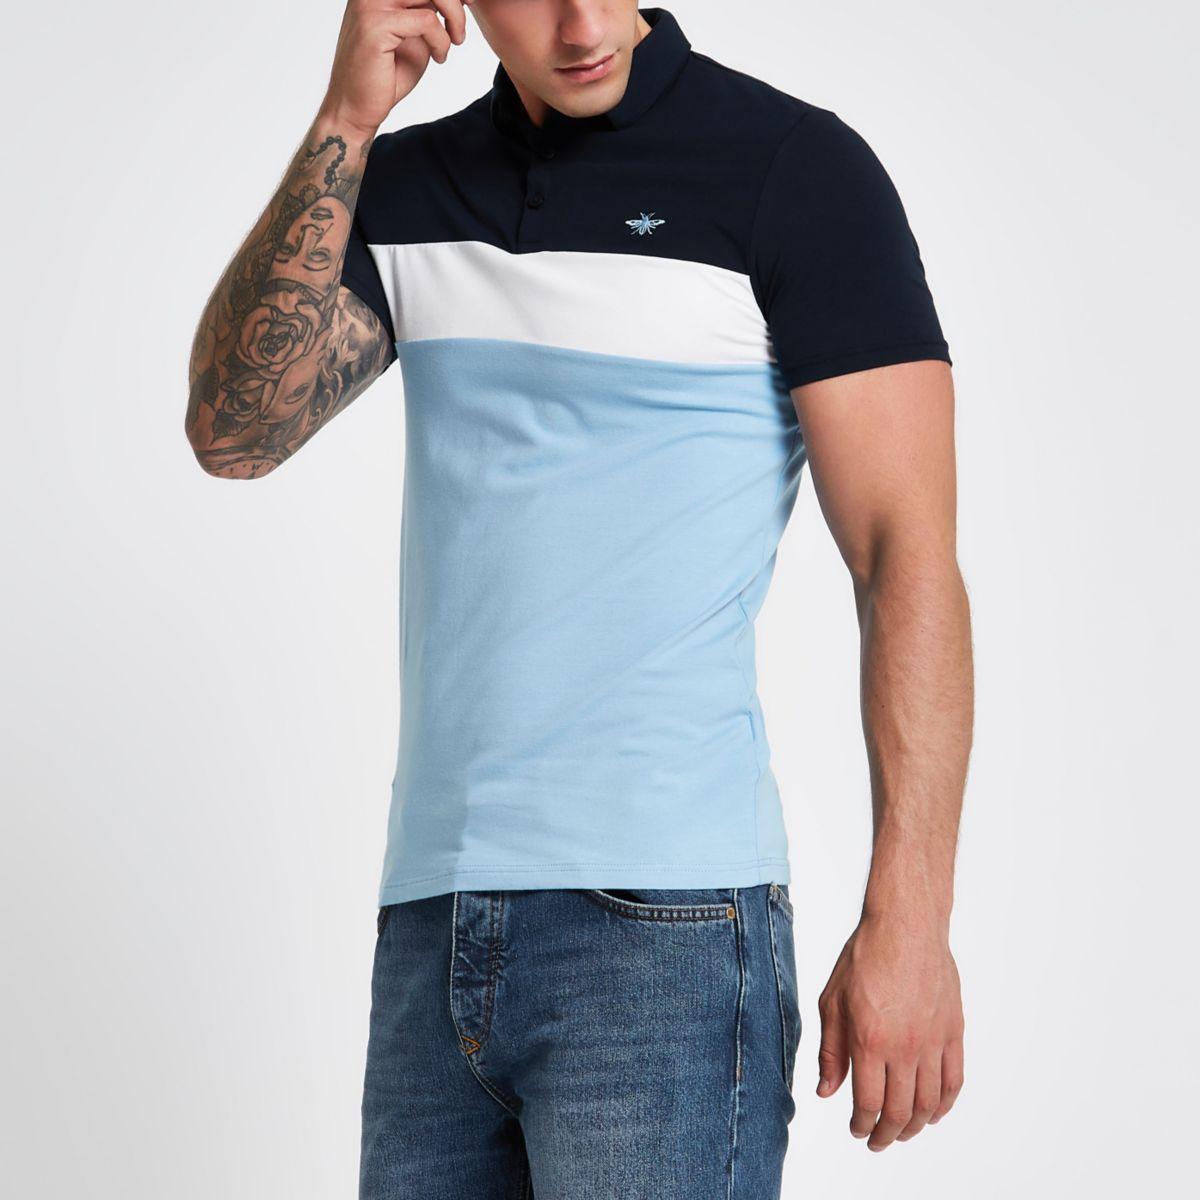 shirt polo fit print Blue muscle block txwqIRcX0